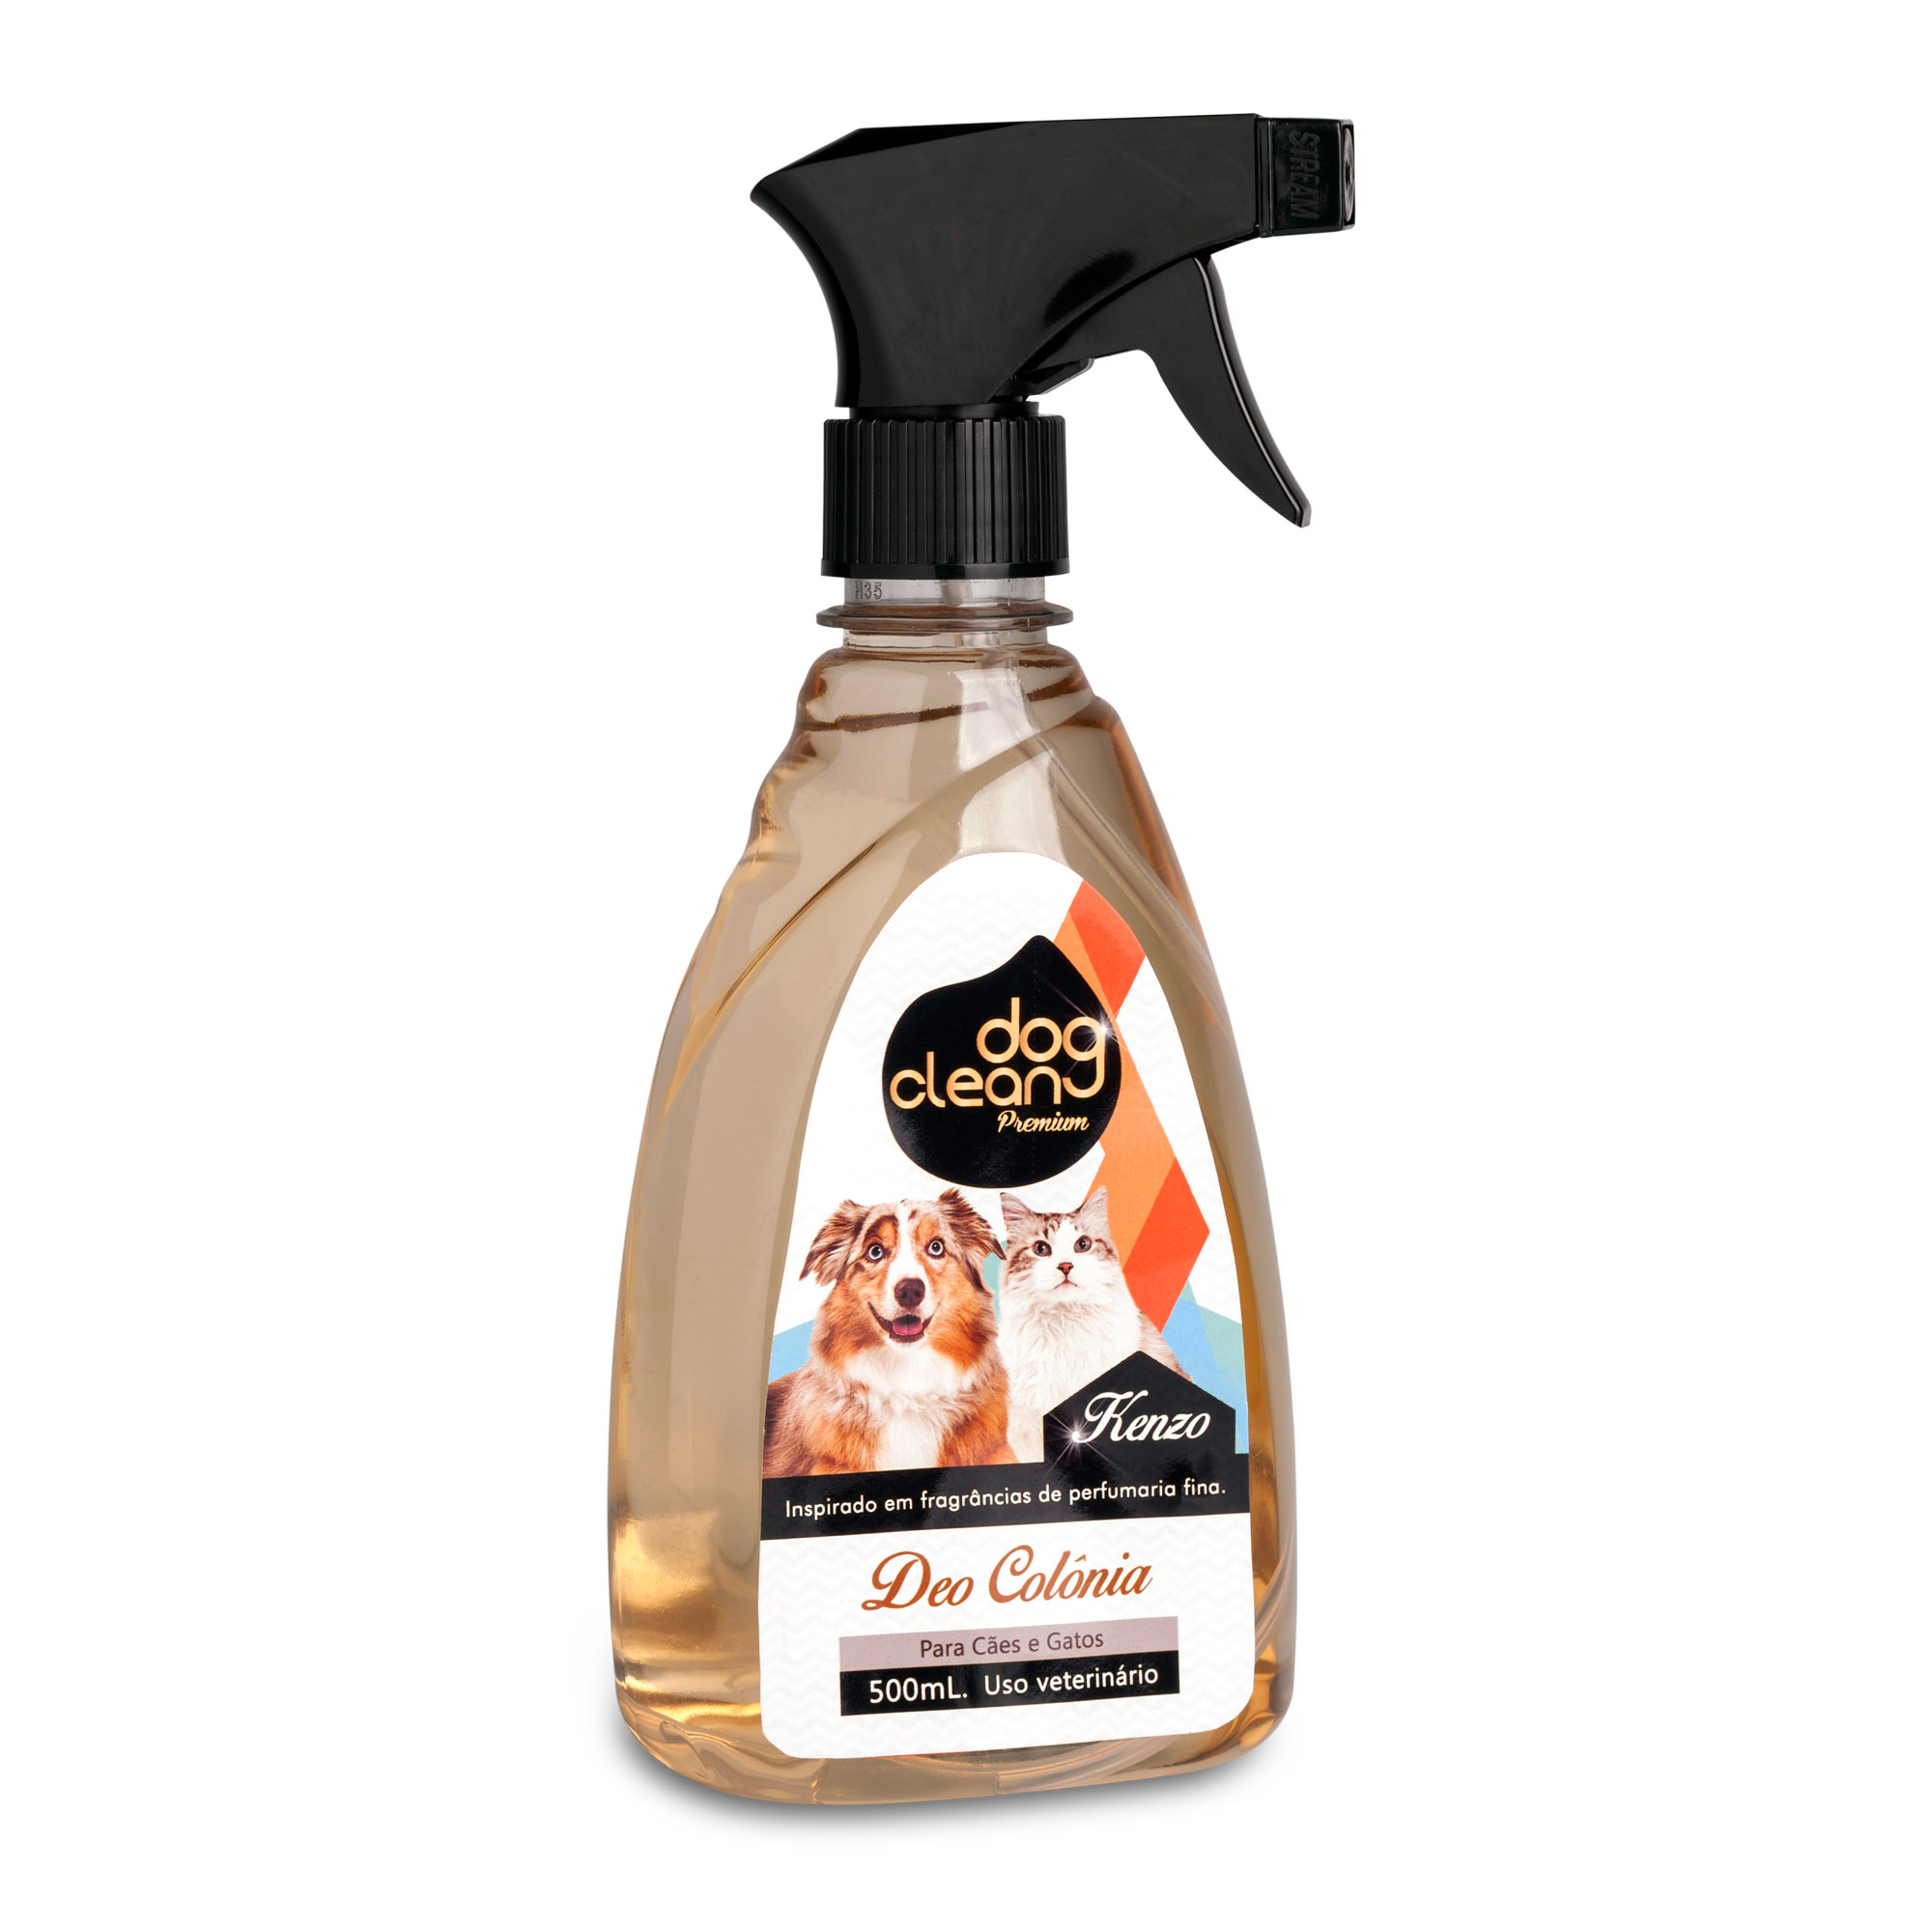 Perfume Deo Colônia Kenzo 500ml Dog Clean